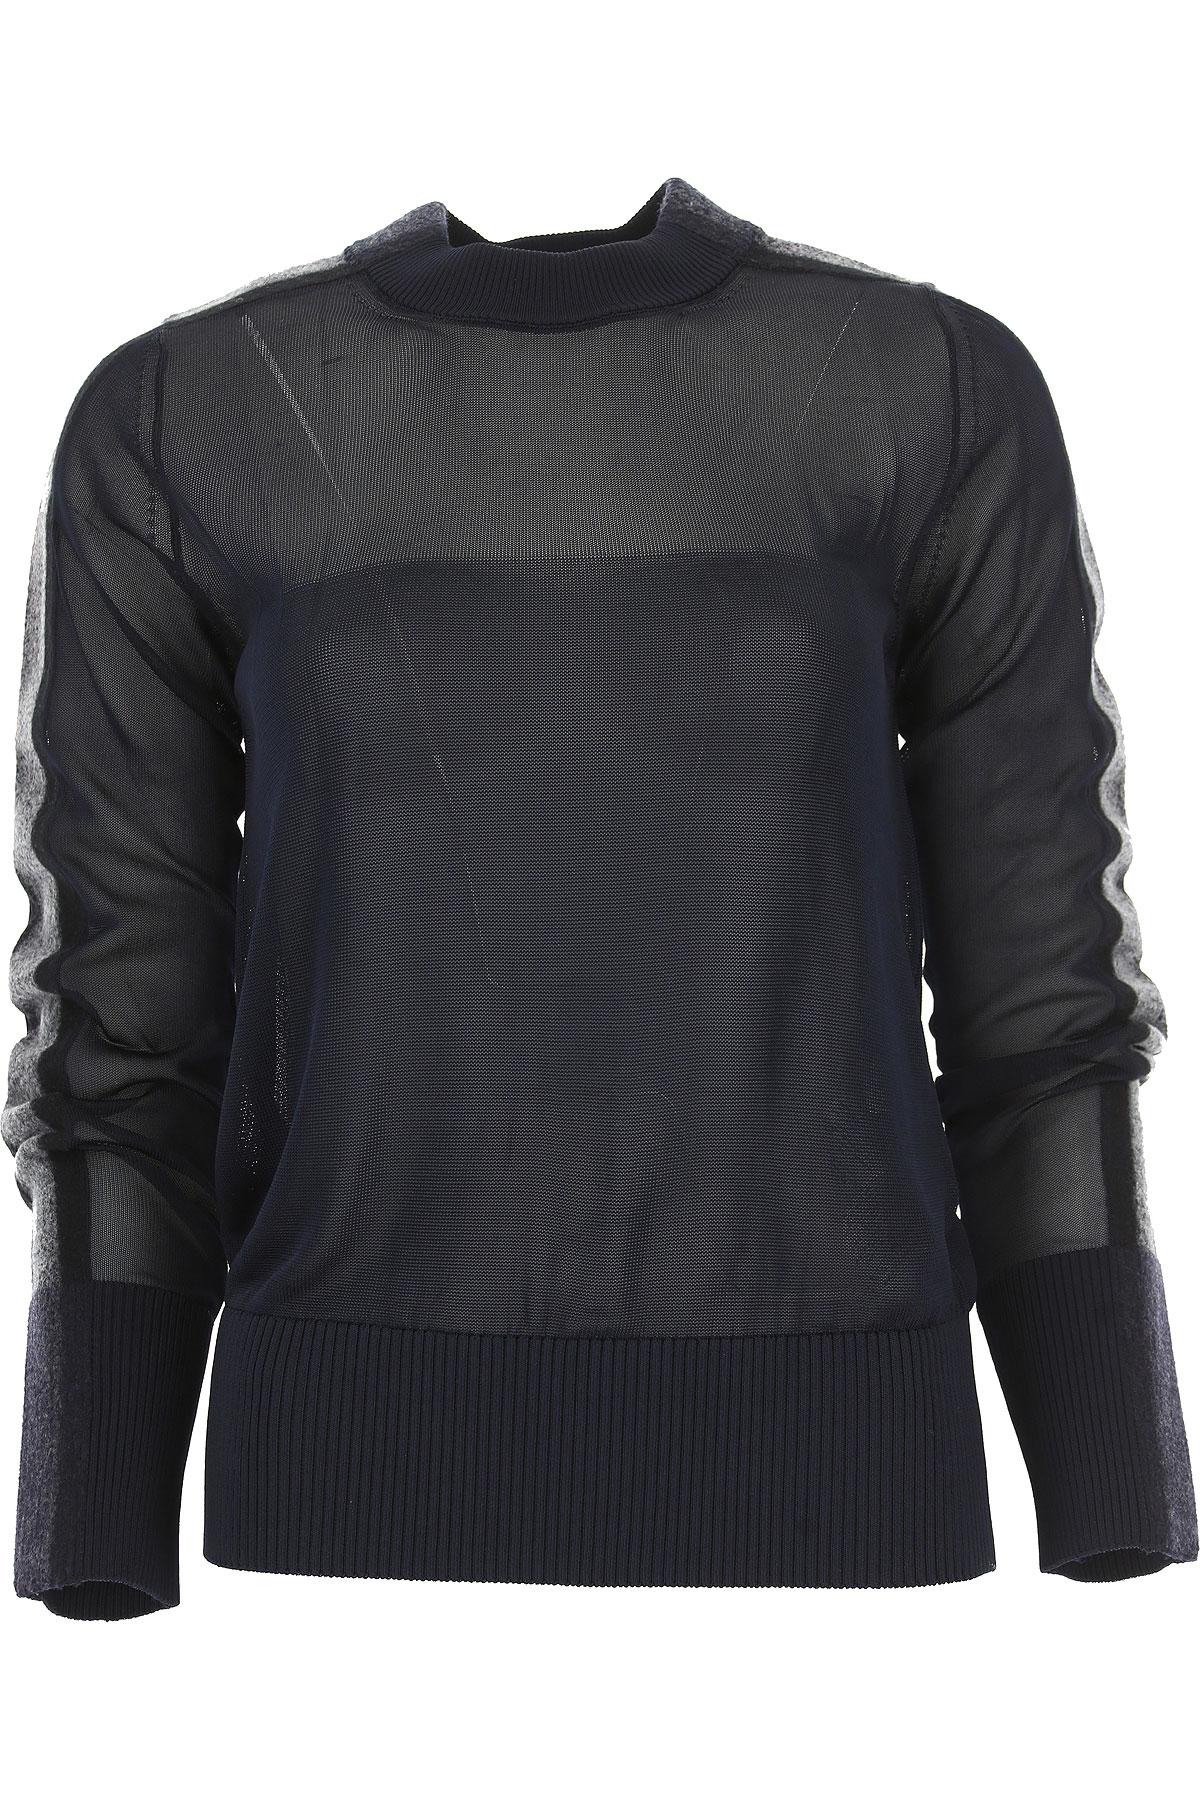 Image of SportMax Sweater for Women Jumper, navy, Viscose, 2017, 10 4 6 8